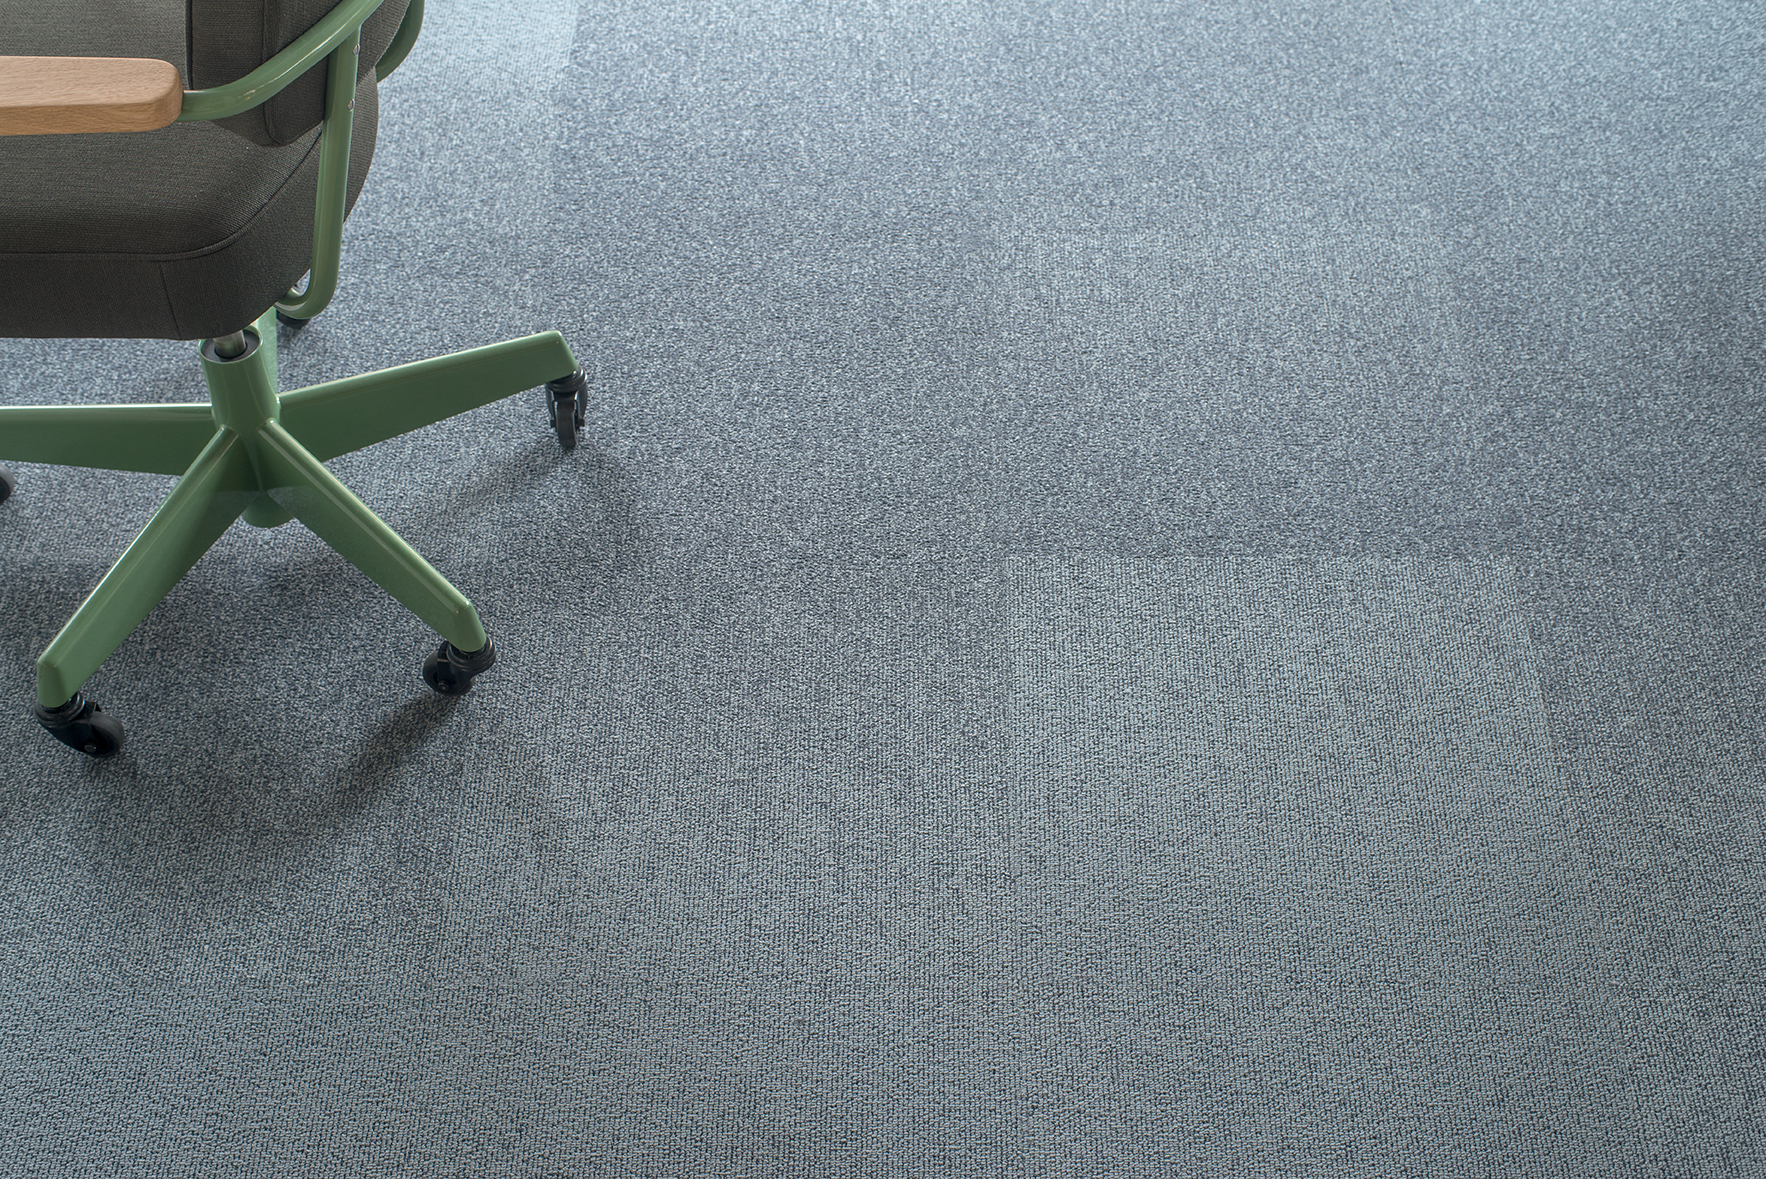 moquette lake moquette anti feu balsan fr. Black Bedroom Furniture Sets. Home Design Ideas